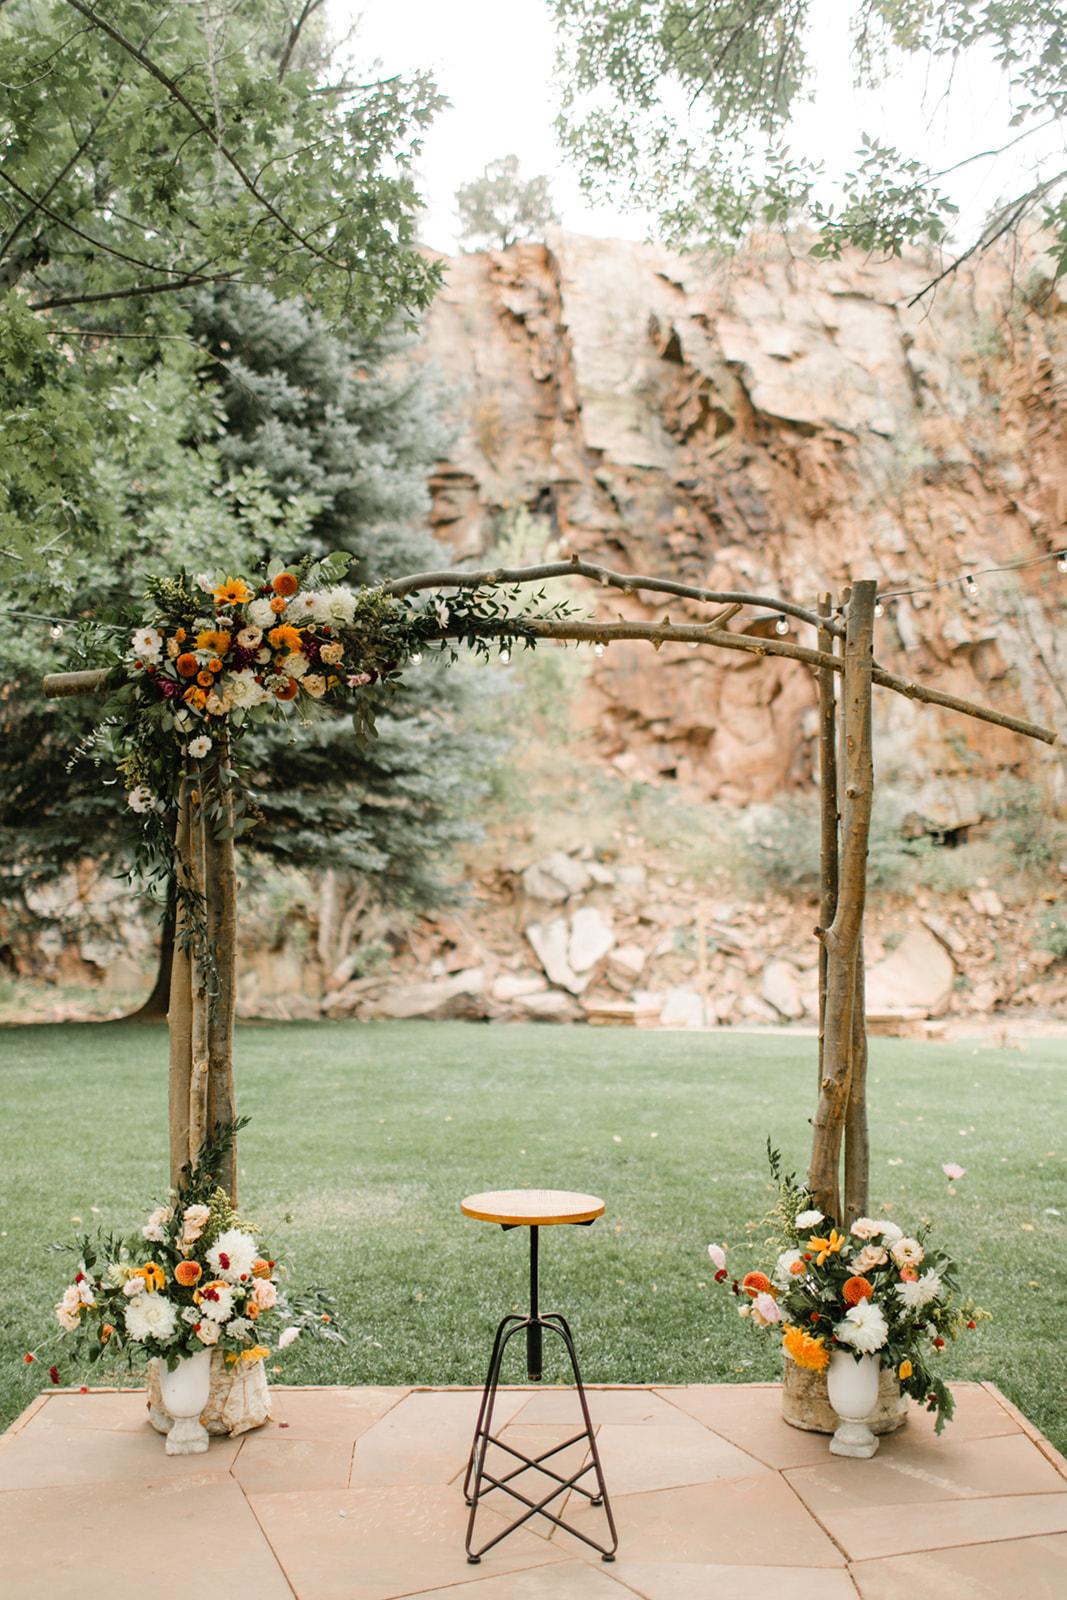 courtney_and_steve_riverbend_wedding_lyons_colorado-167.jpg